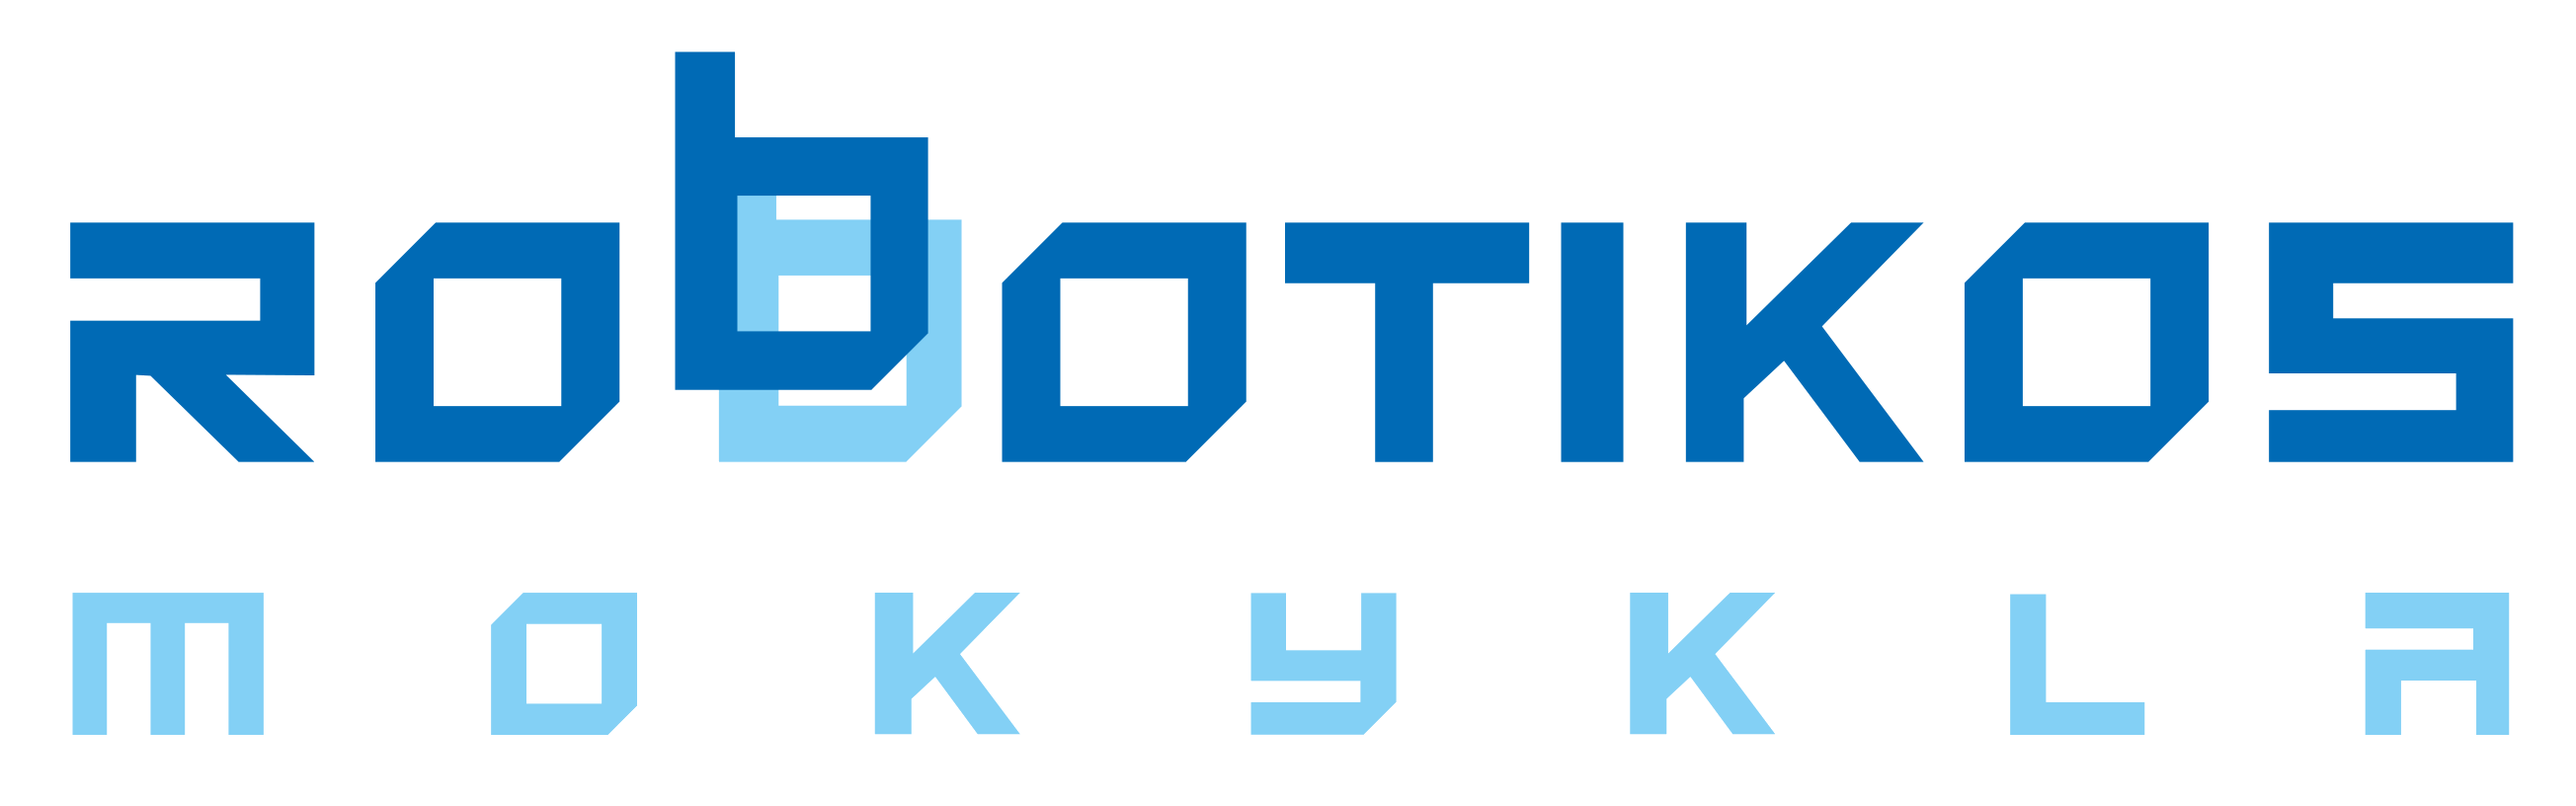 troosik_LOGO (1)-1.png